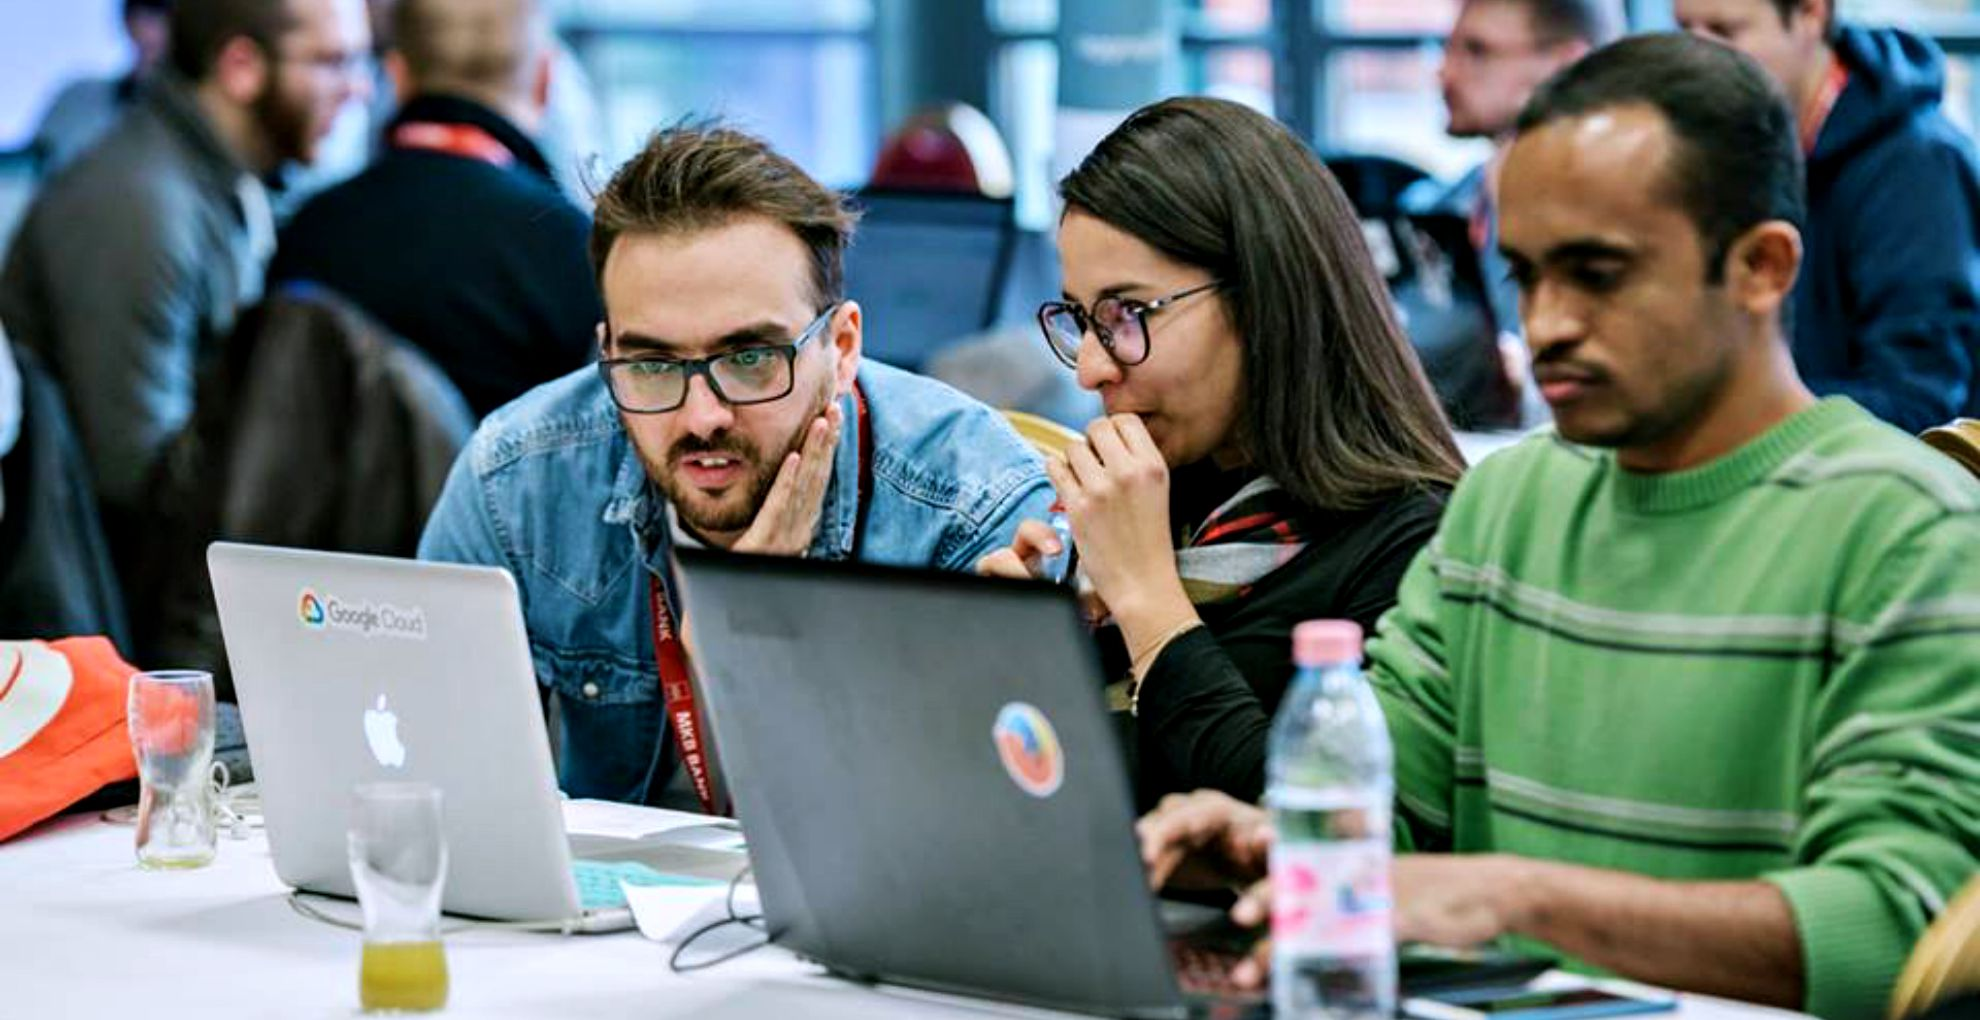 MKB Fintechlab fintech hackathon